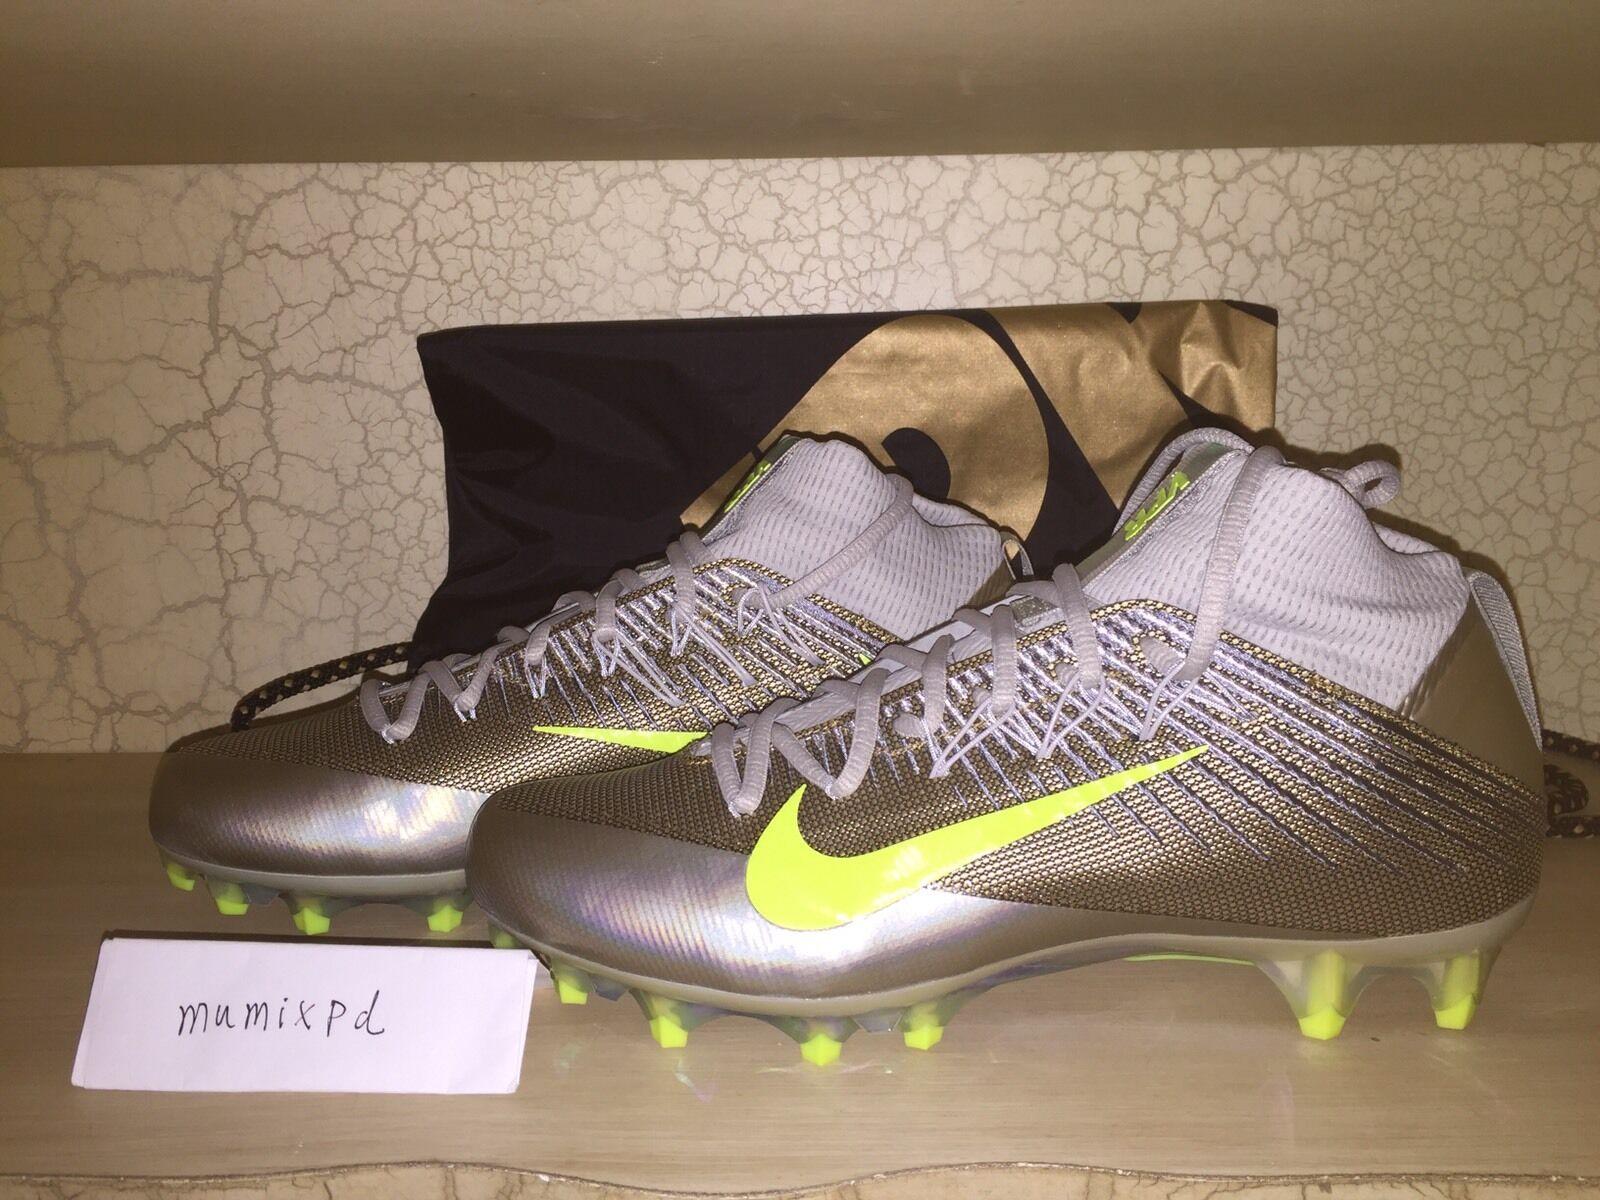 Nike Vapor Untouchable 2 Wolf Grey Platinum Volt 824470-010 Football elite 9.5